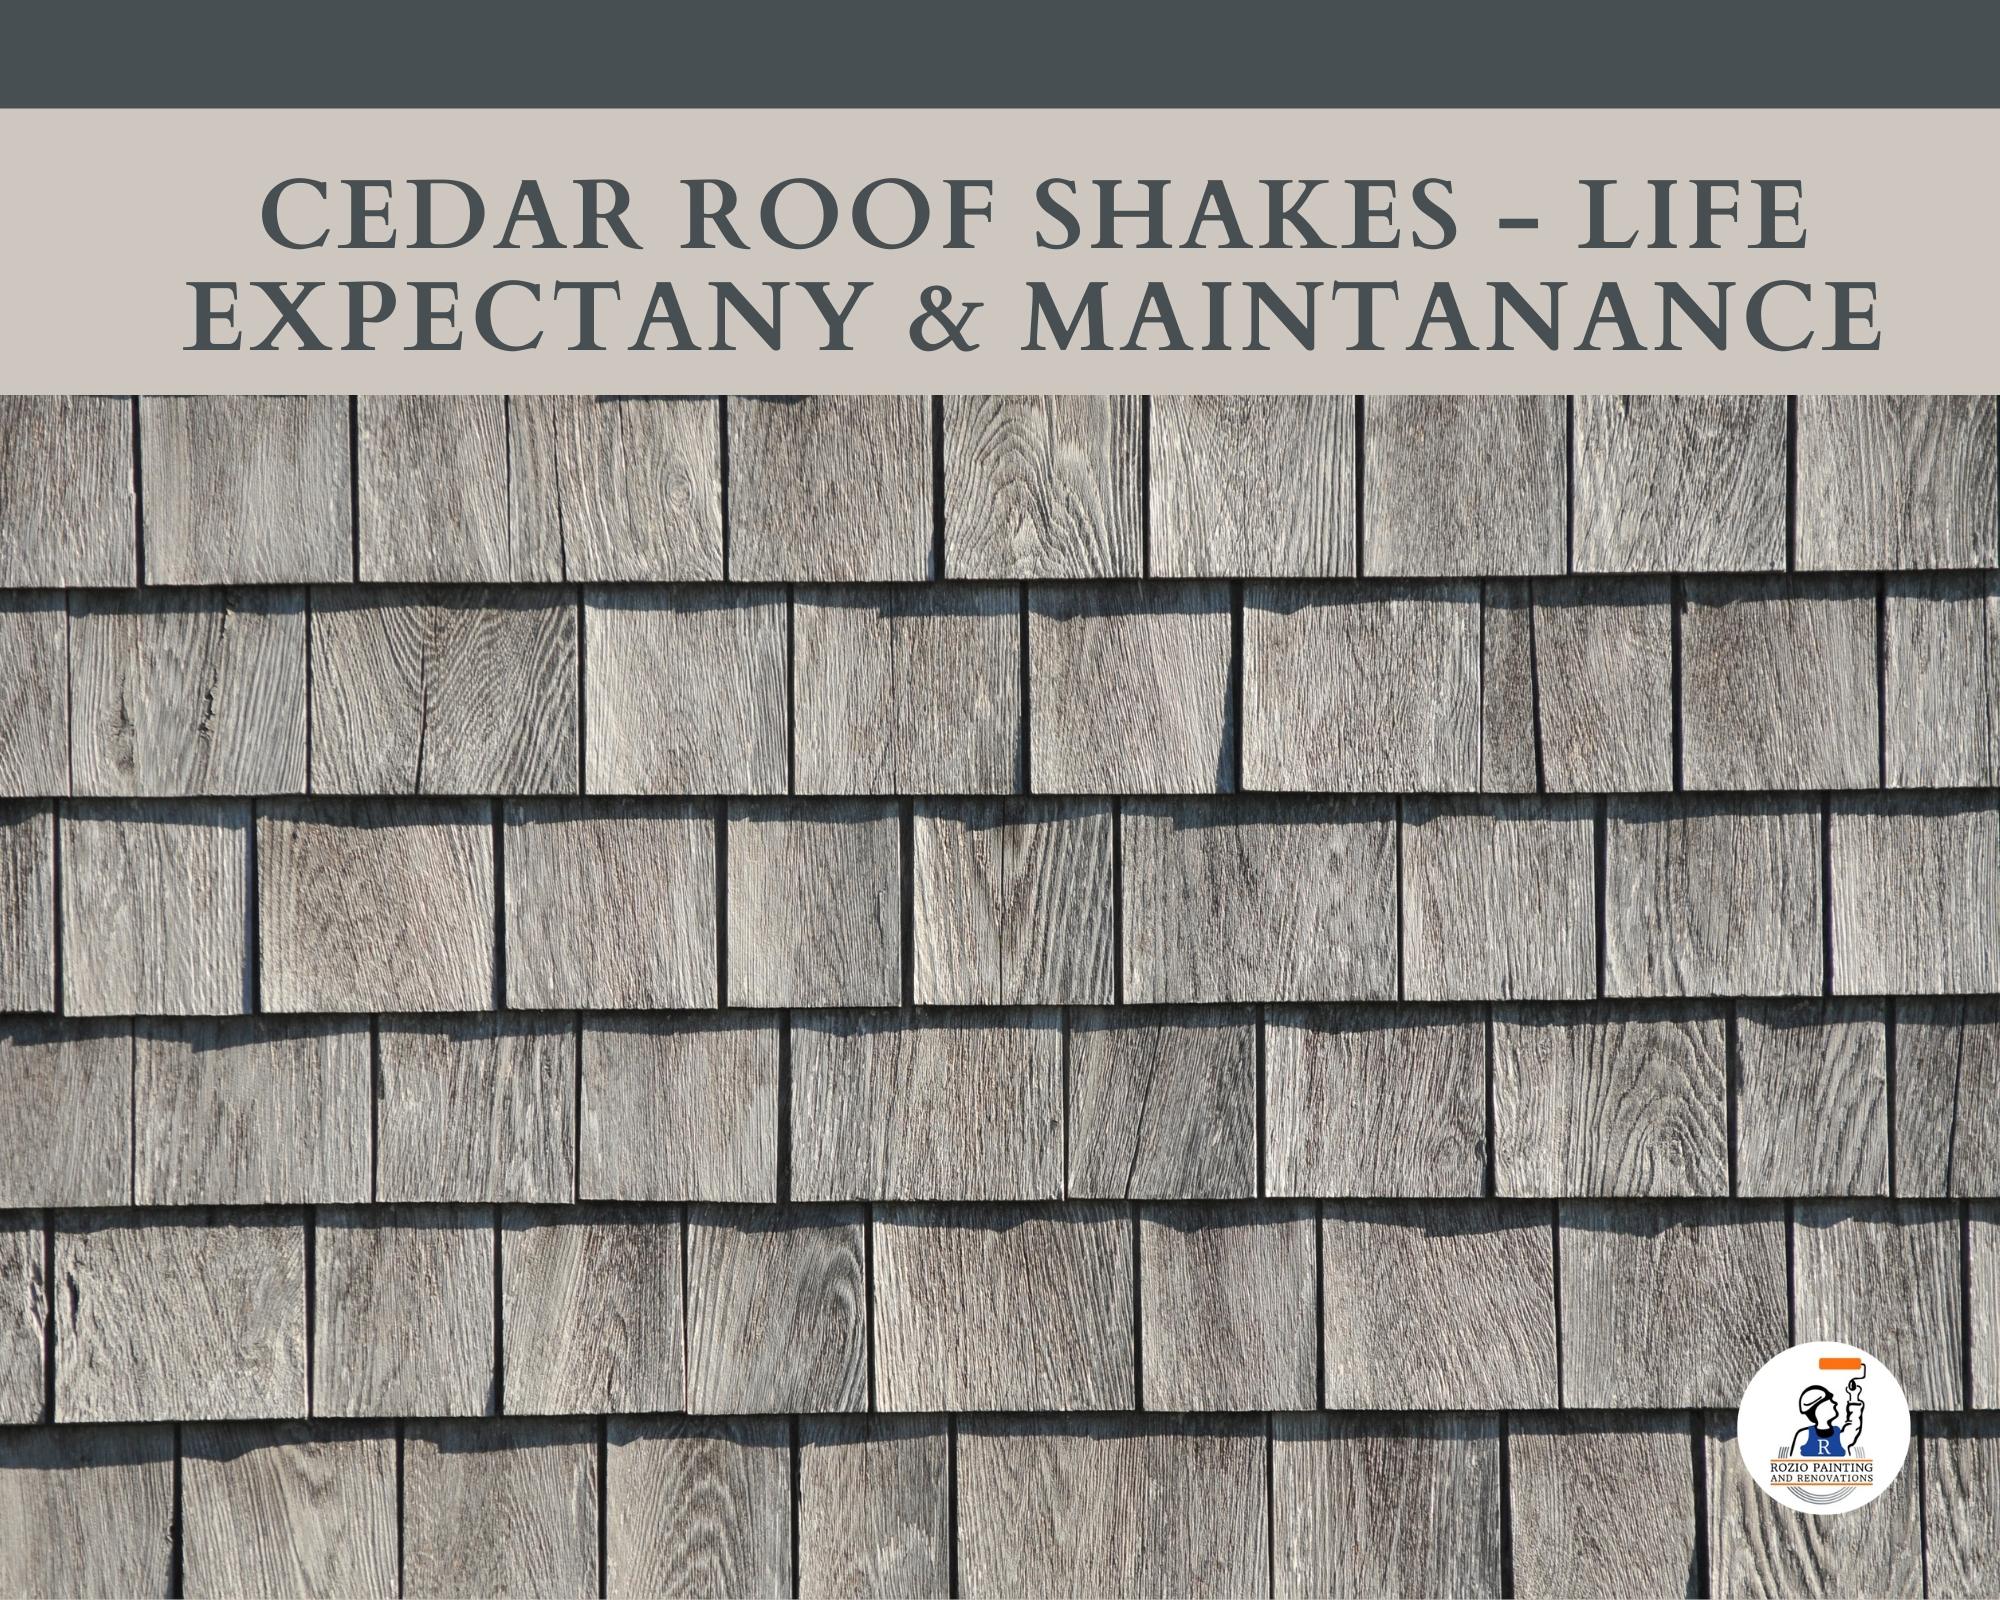 Cedar Roof Shakes - Life Expectany & Maintenance